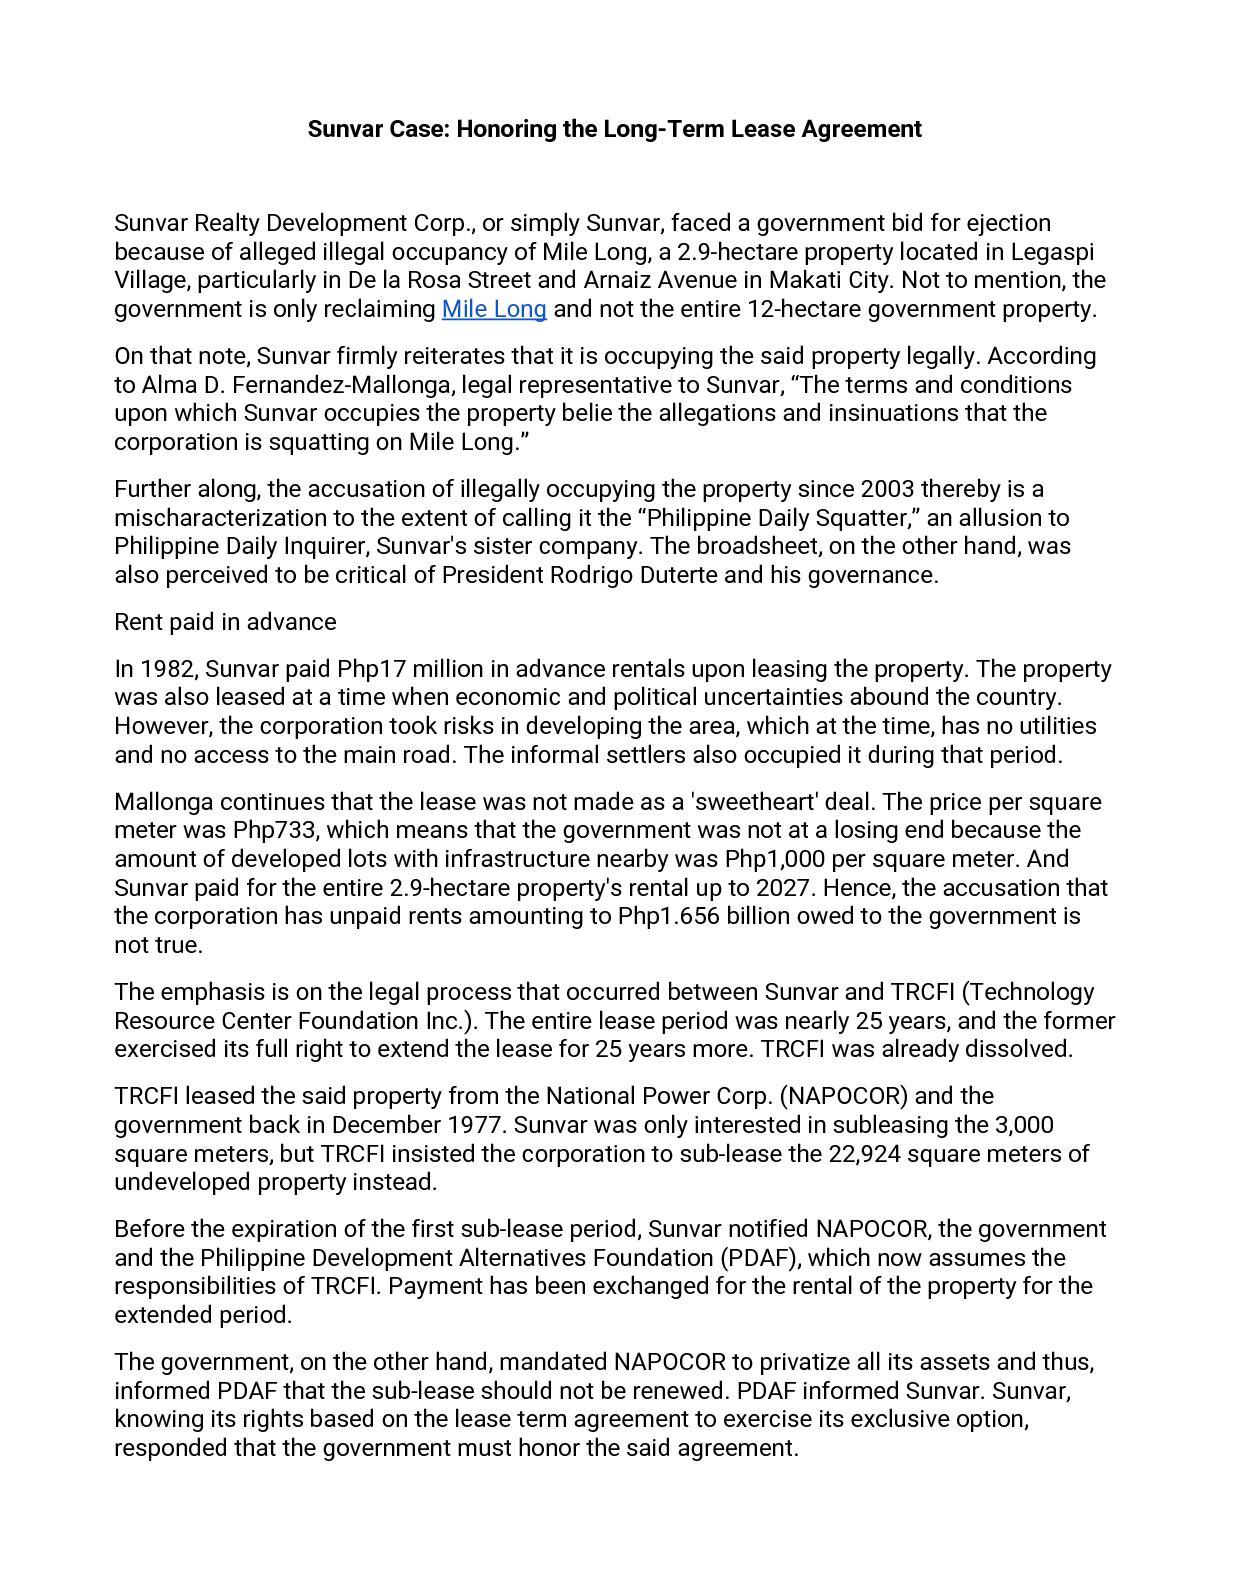 Calamo Sunvar Case Honoring The Long Term Lease Agreement